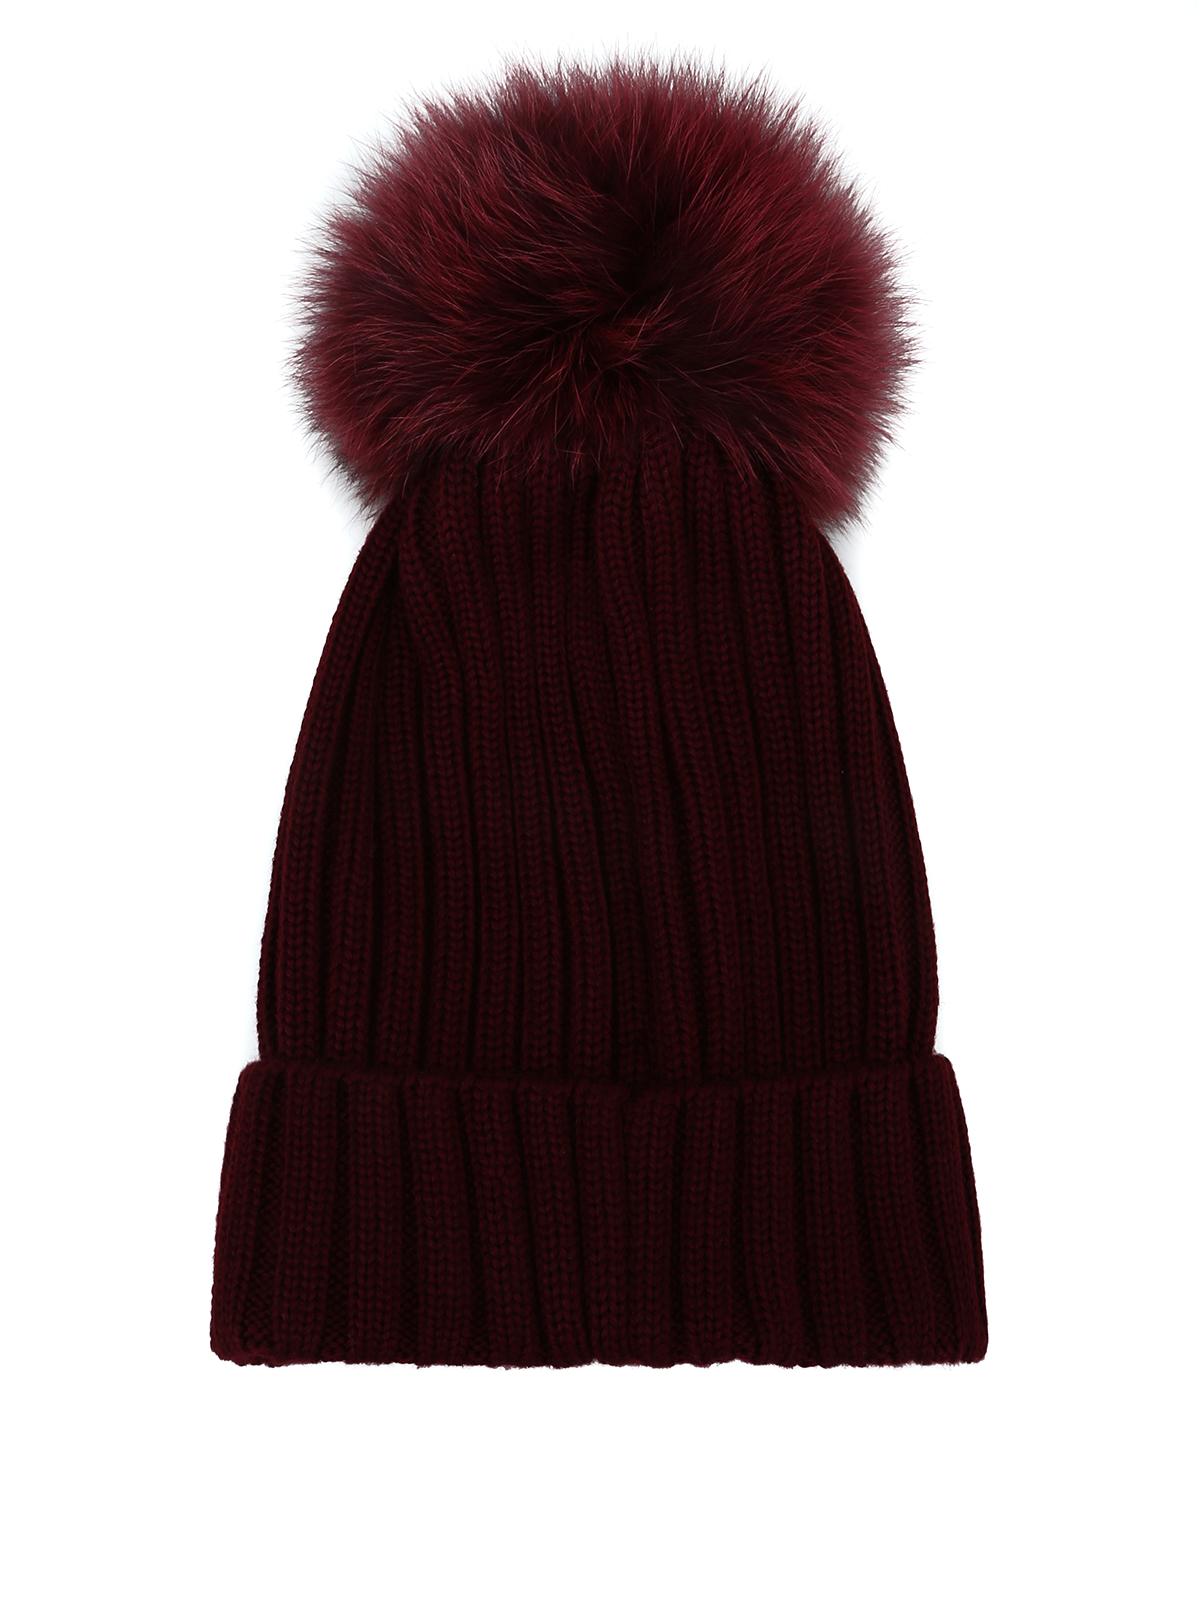 3ee3c2ca526 Moncler - Fur pompom burgundy ribbed wool beanie - beanies - D2 093 ...